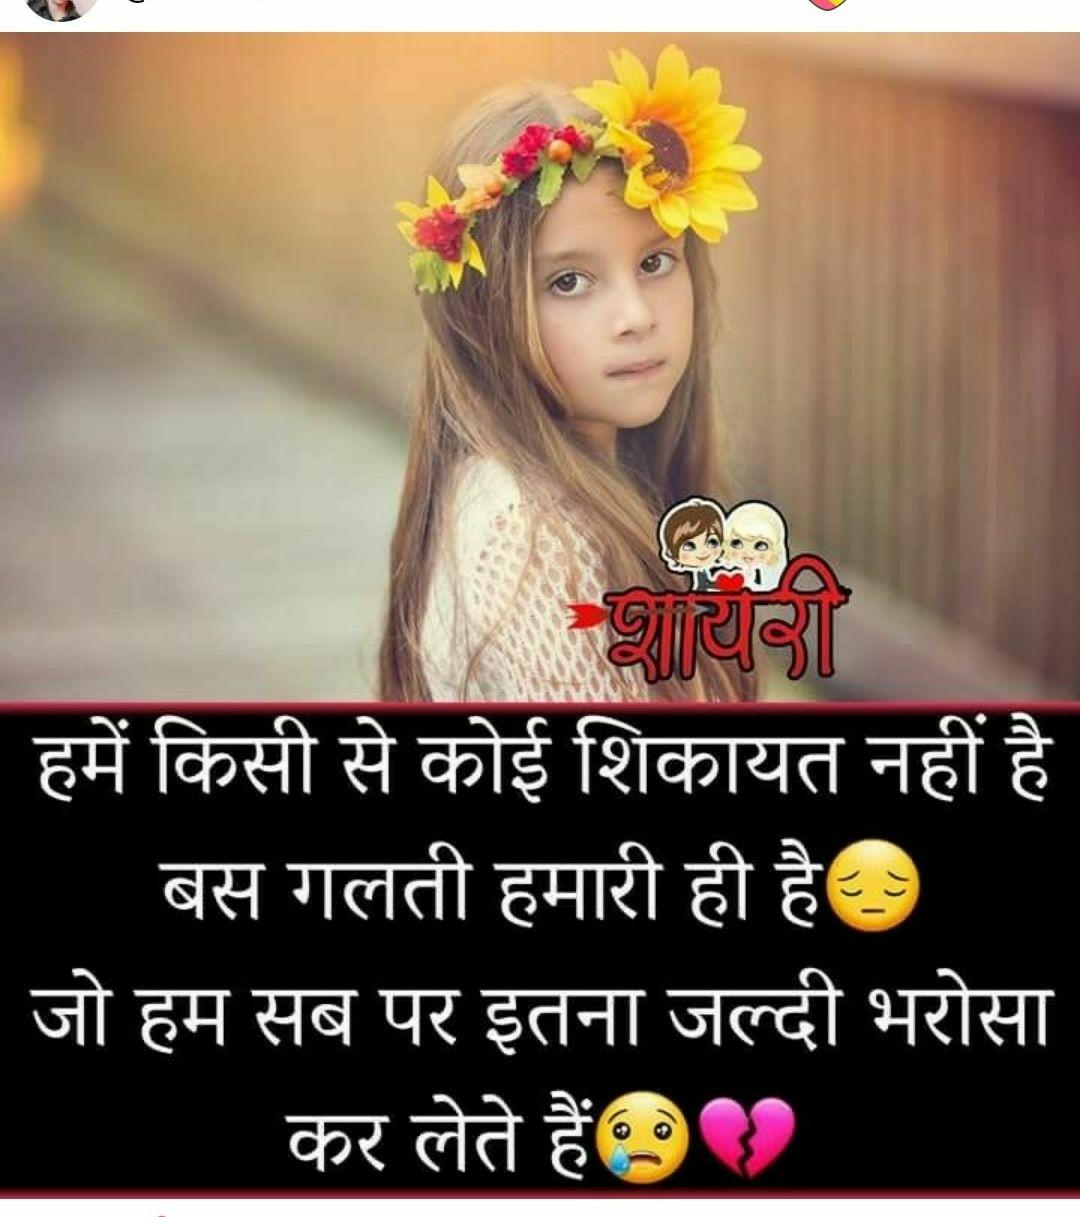 शुभरात्रि - ShareChat